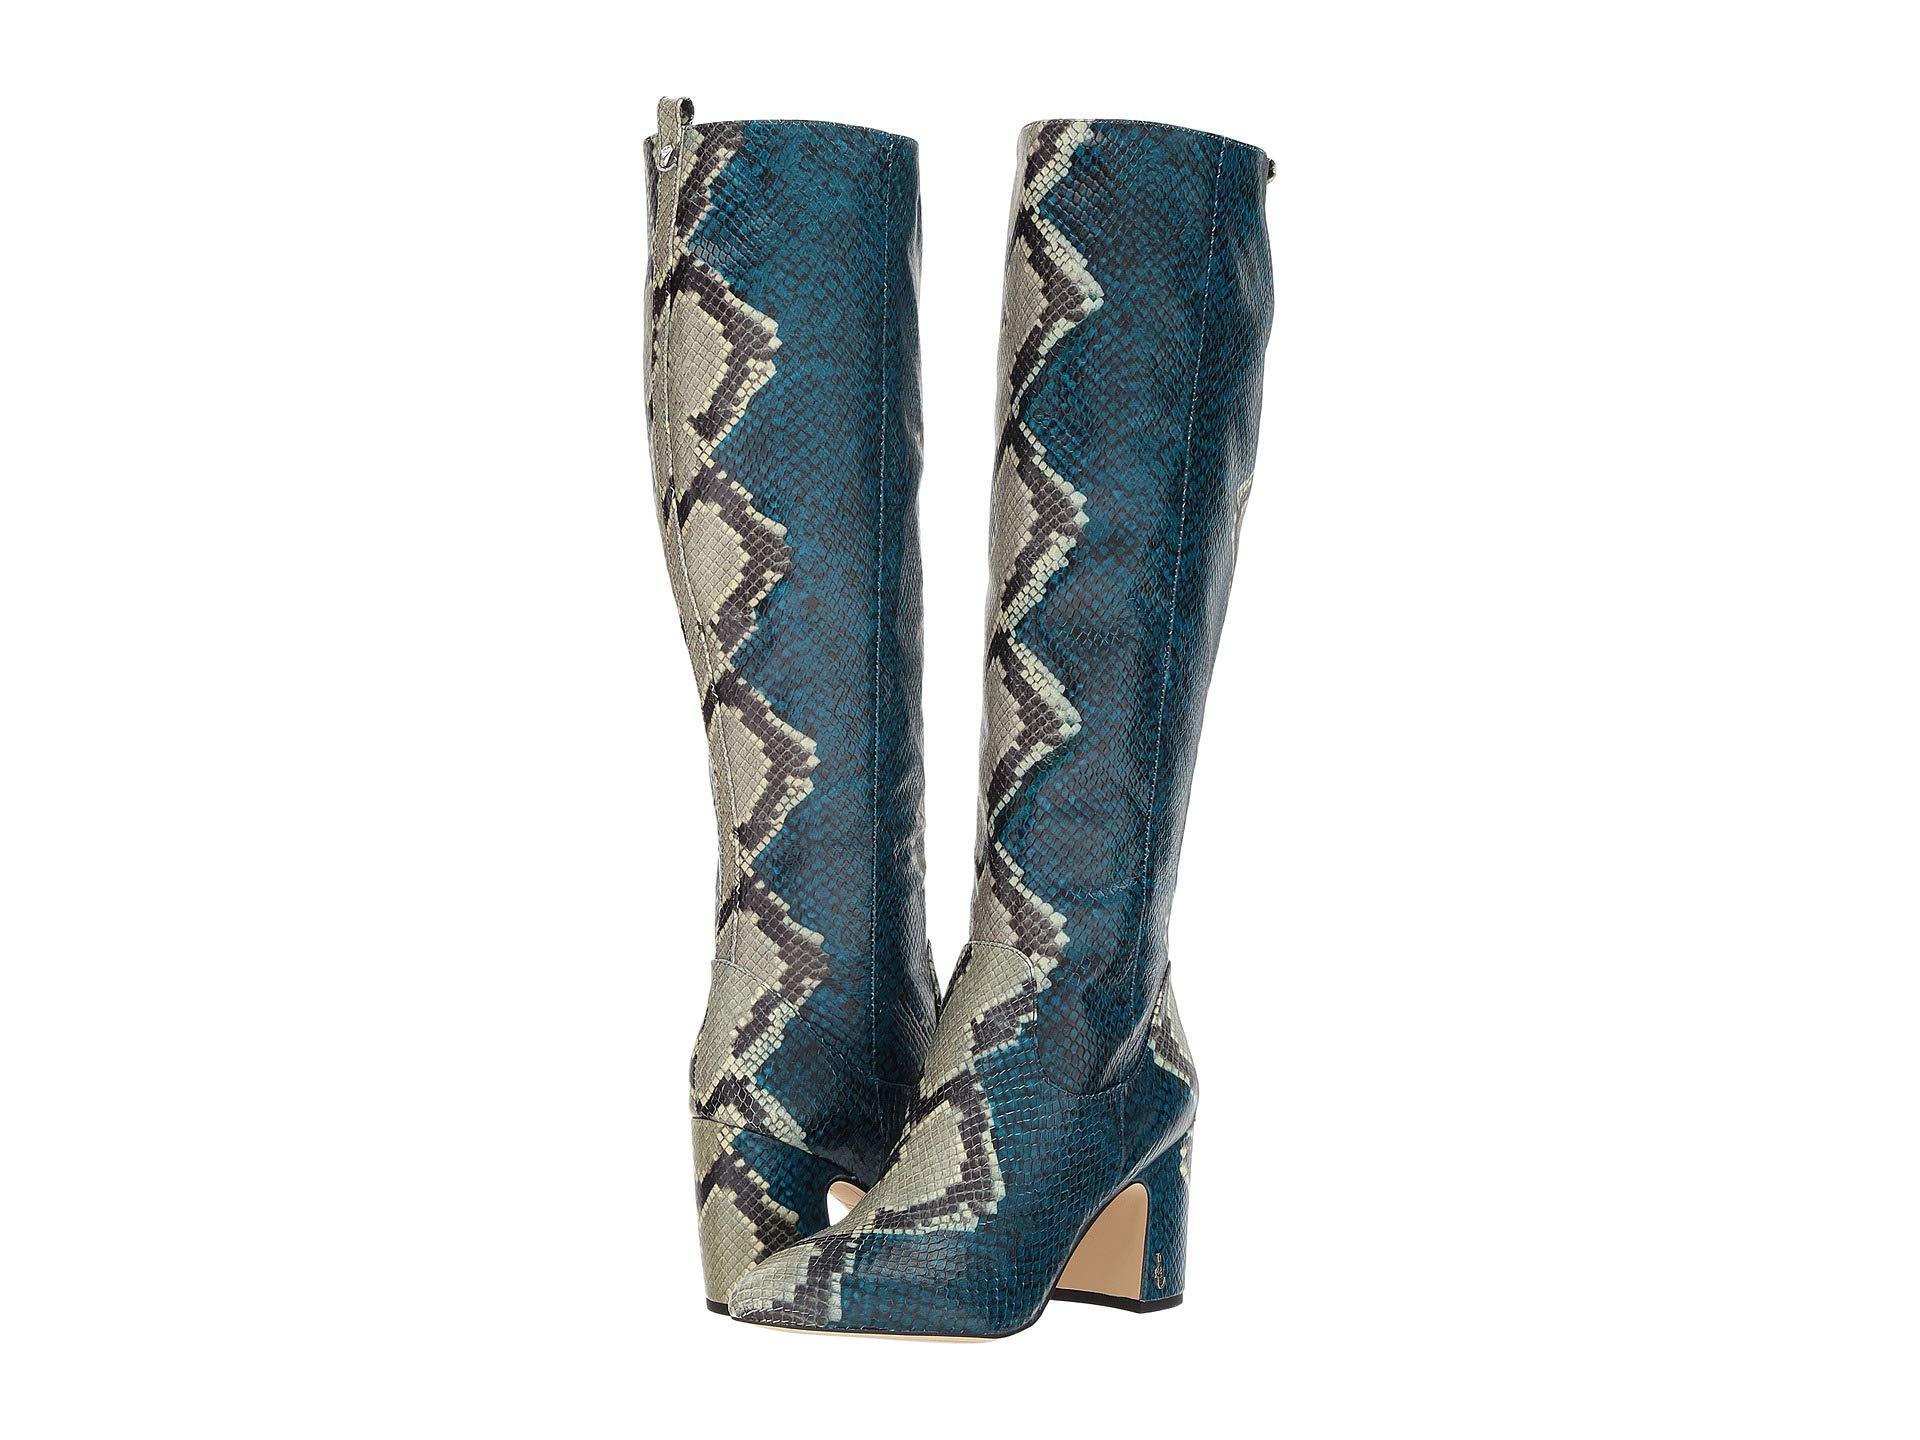 681ebc578723e1 Lyst - Sam Edelman Women s Hai Snakeskin Knee-high Boots - Peacock ...